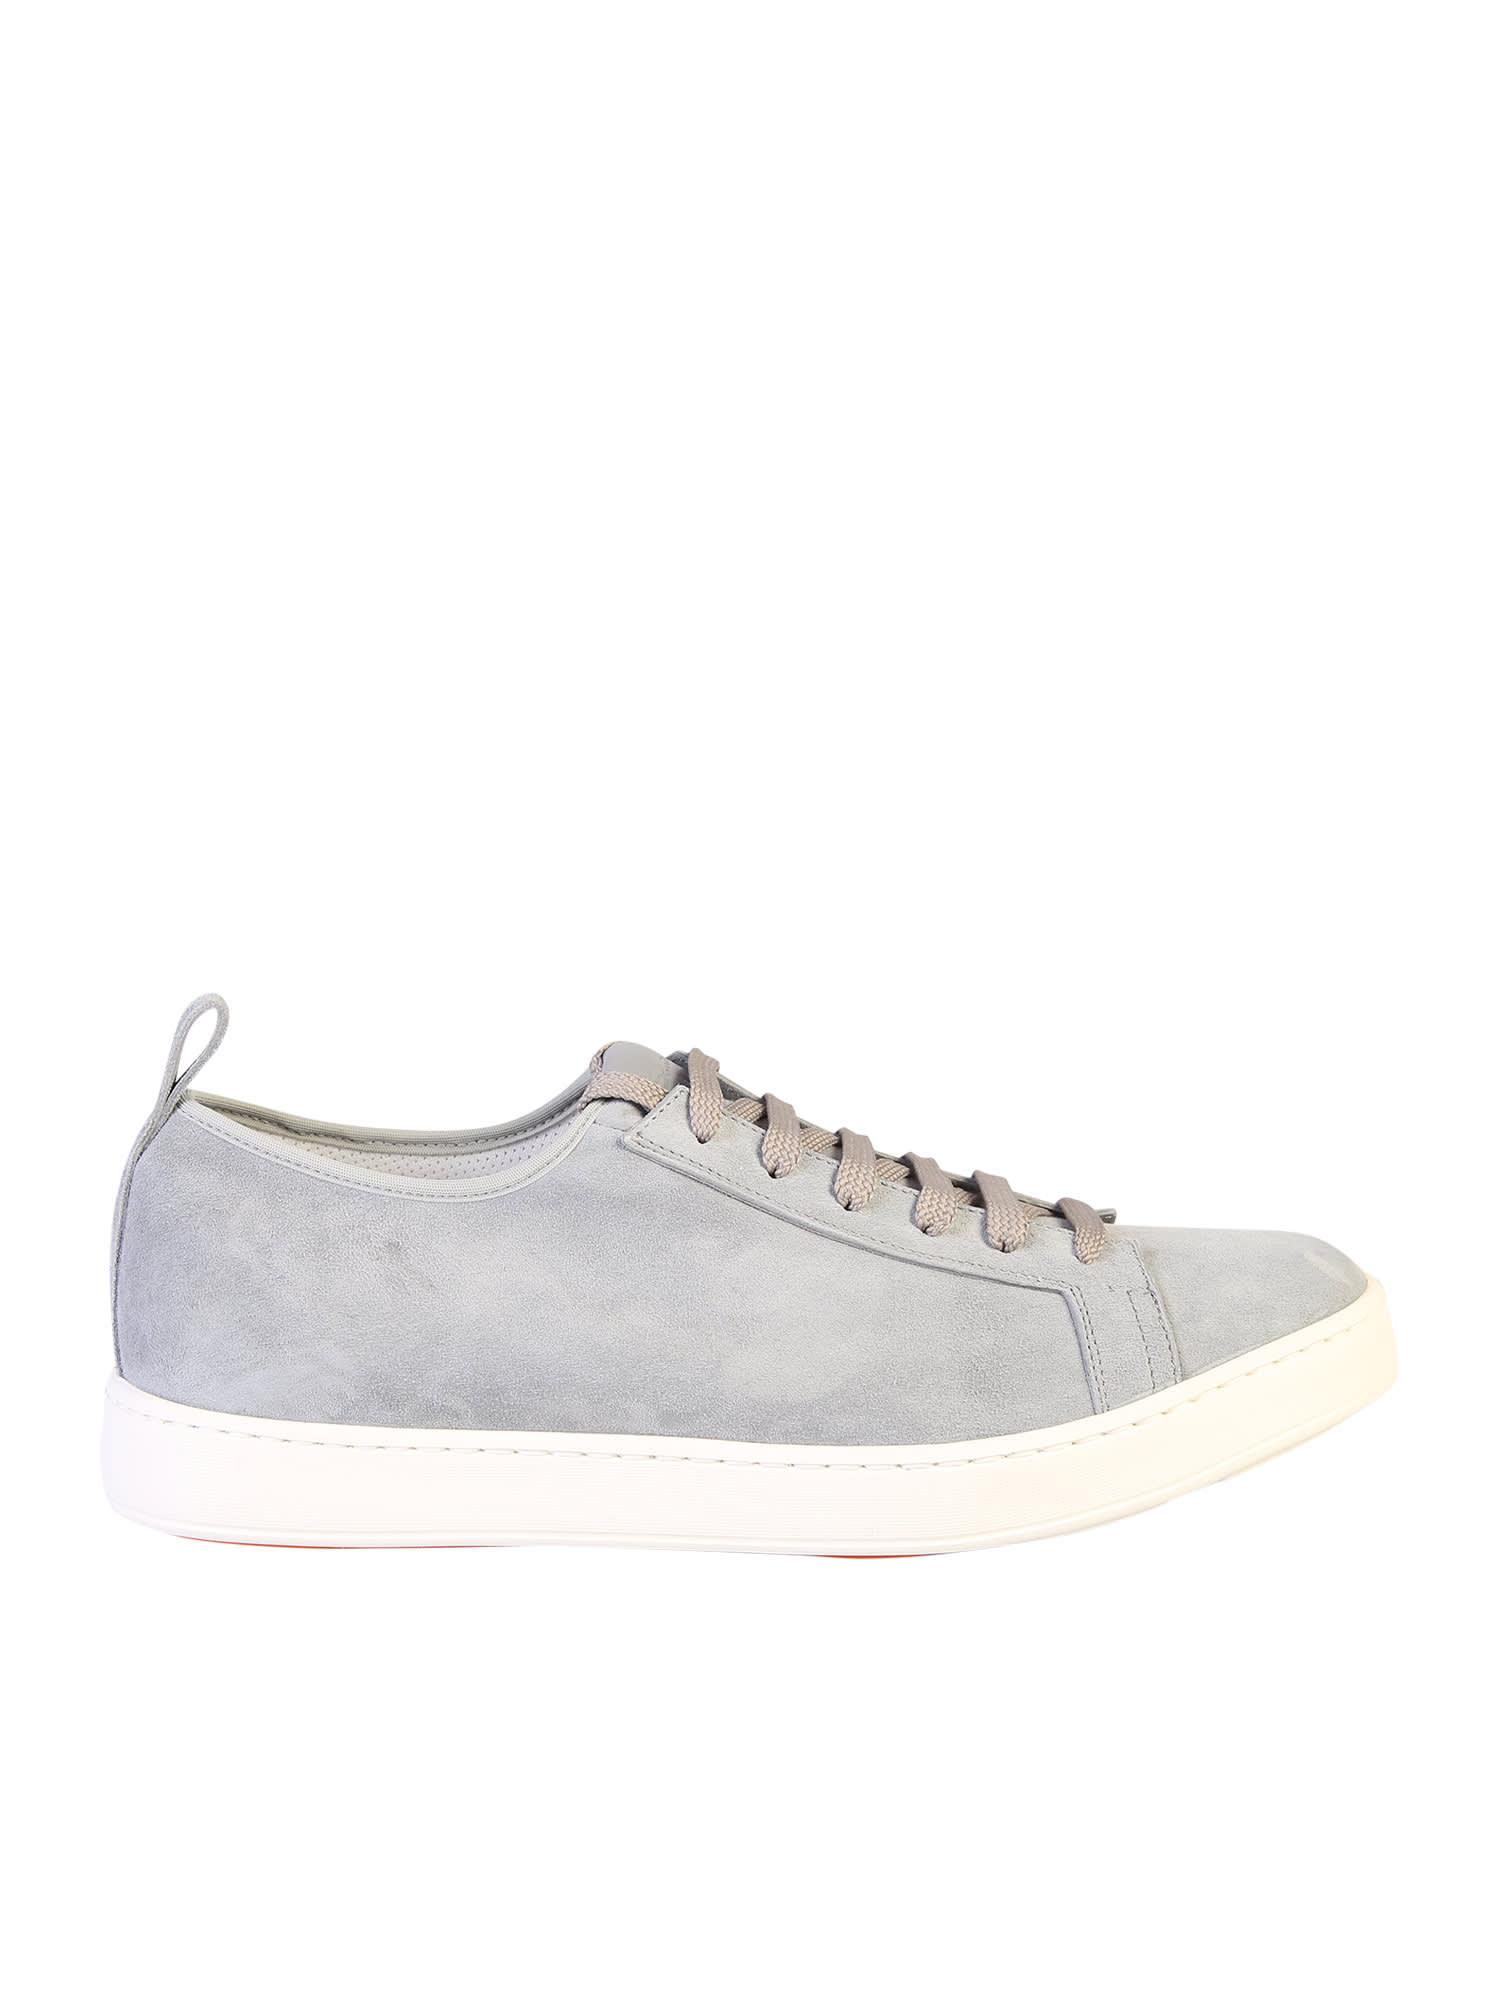 Santoni Lace Up Sneakers